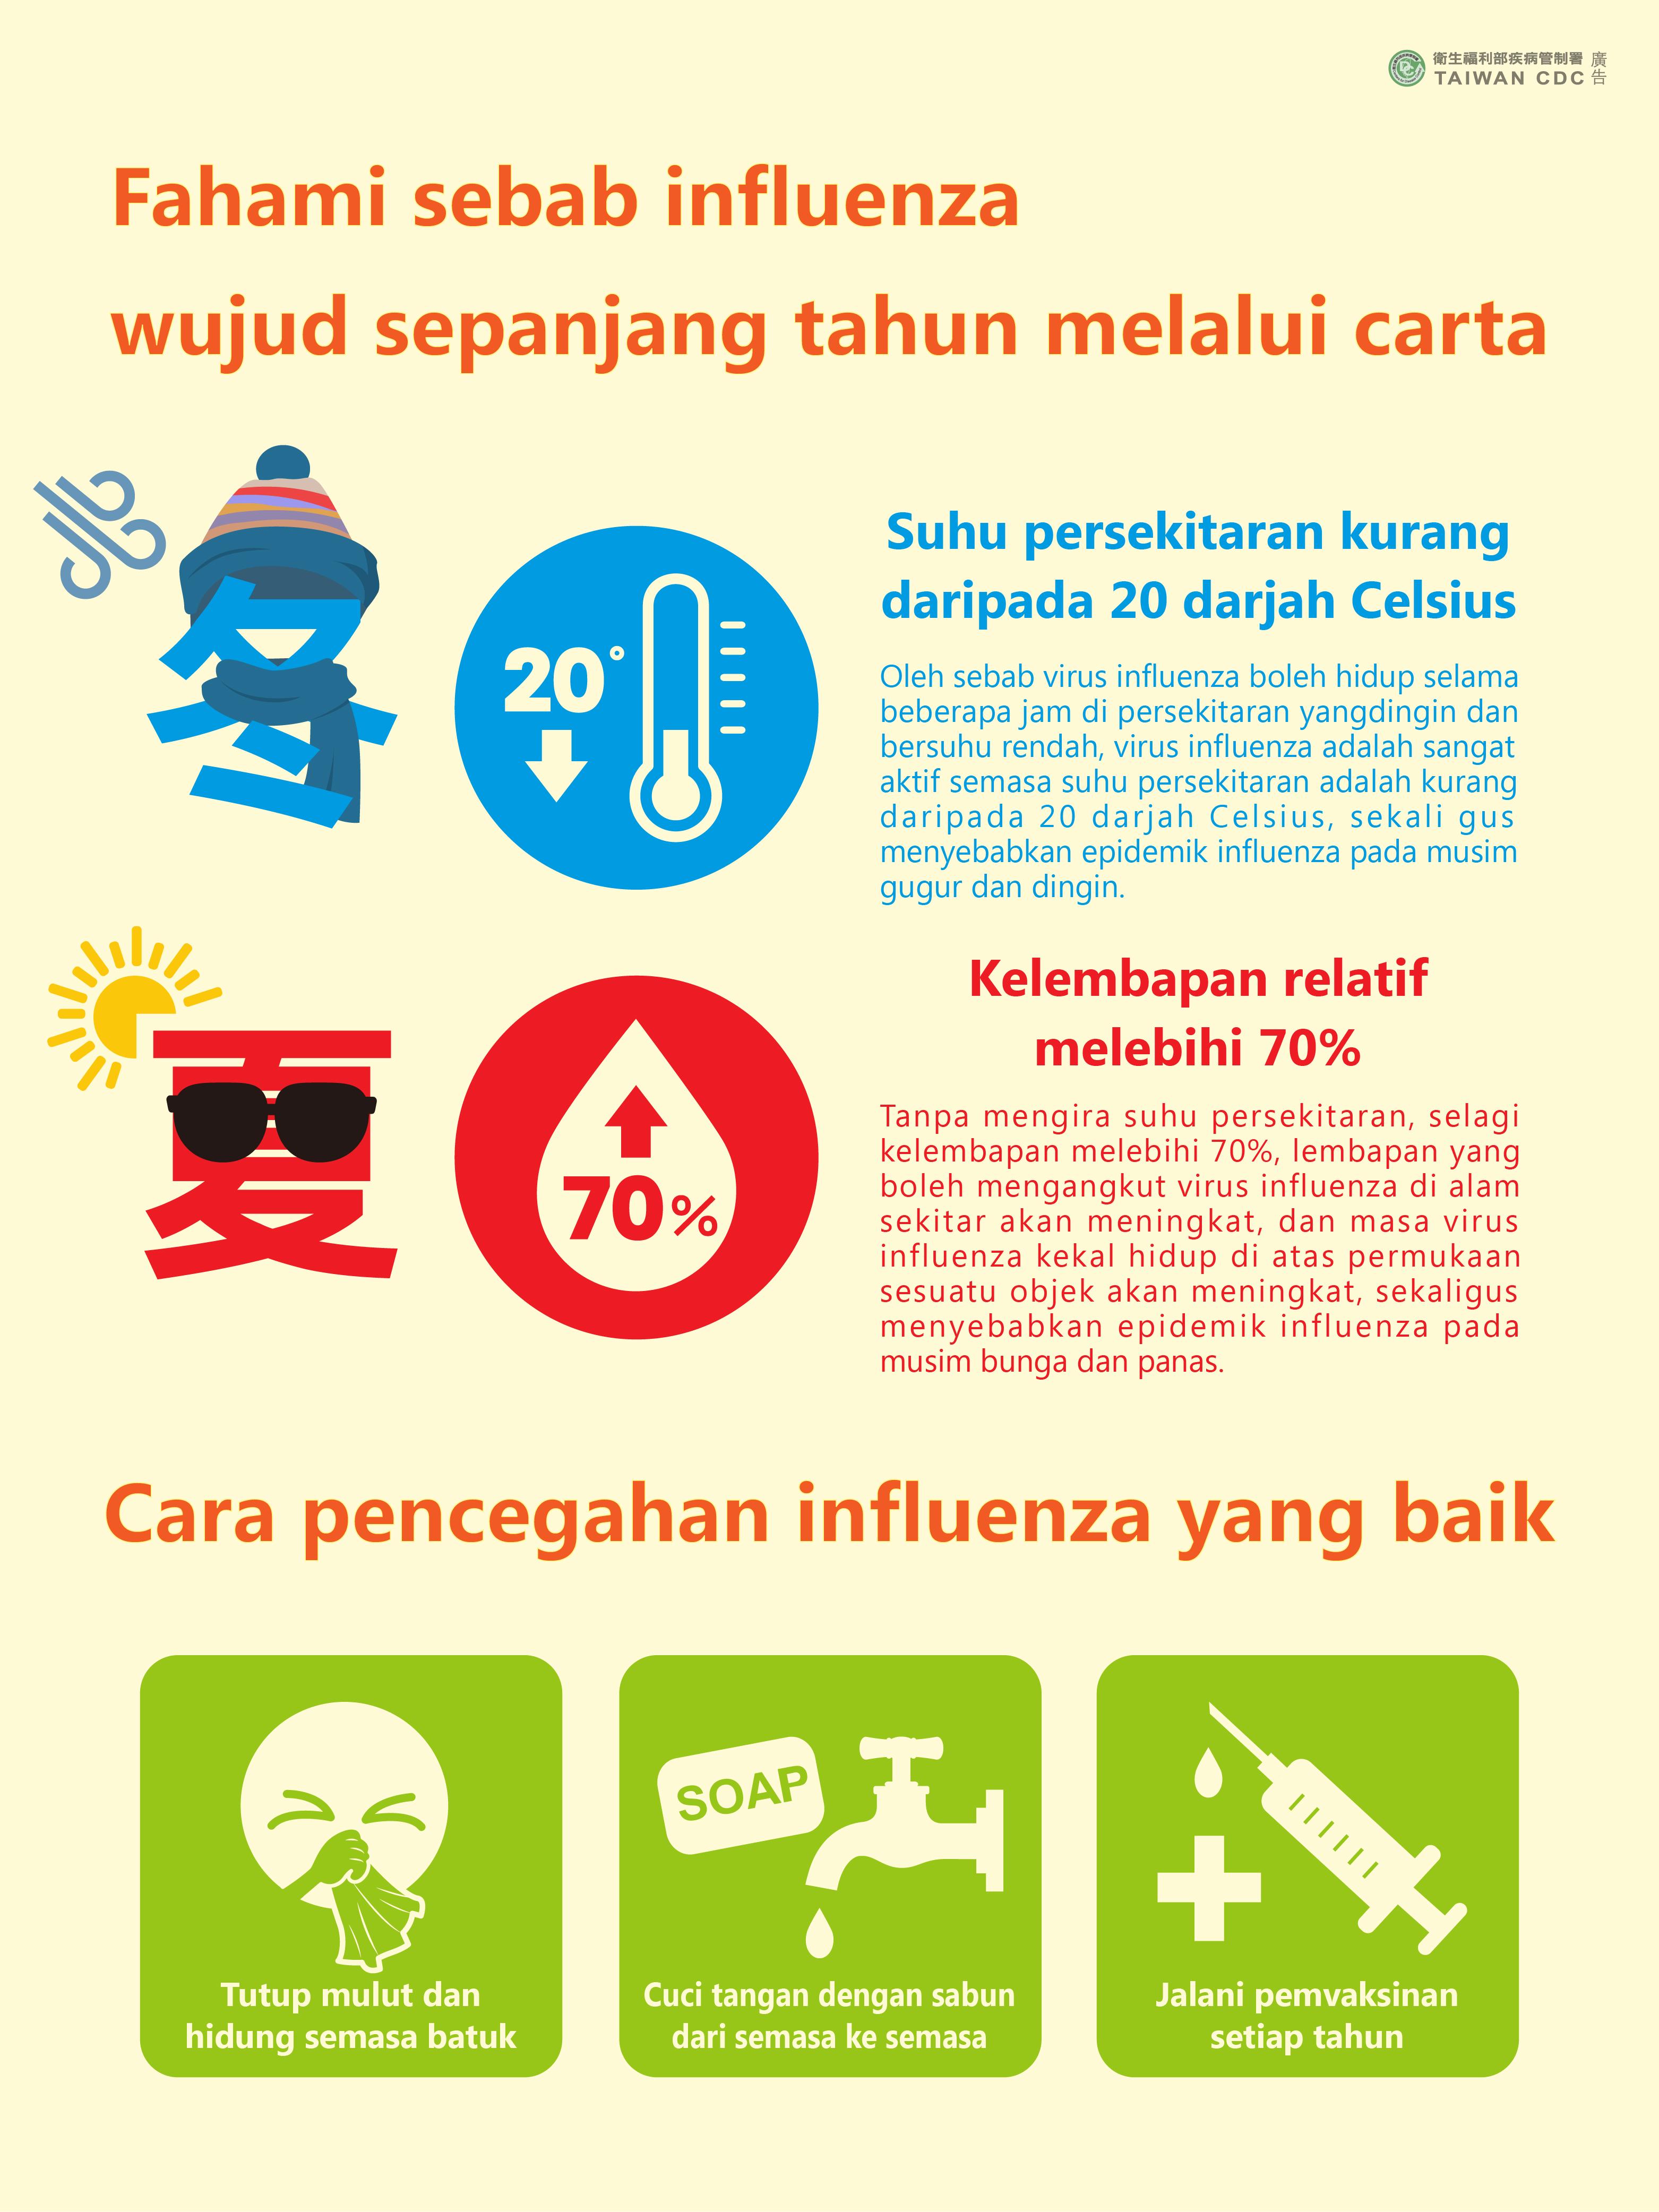 詳如附件【klik saya】Fahami sebab influenza wujud sepanjang tahun melalui carta為什麼全年都有流感(馬來文)